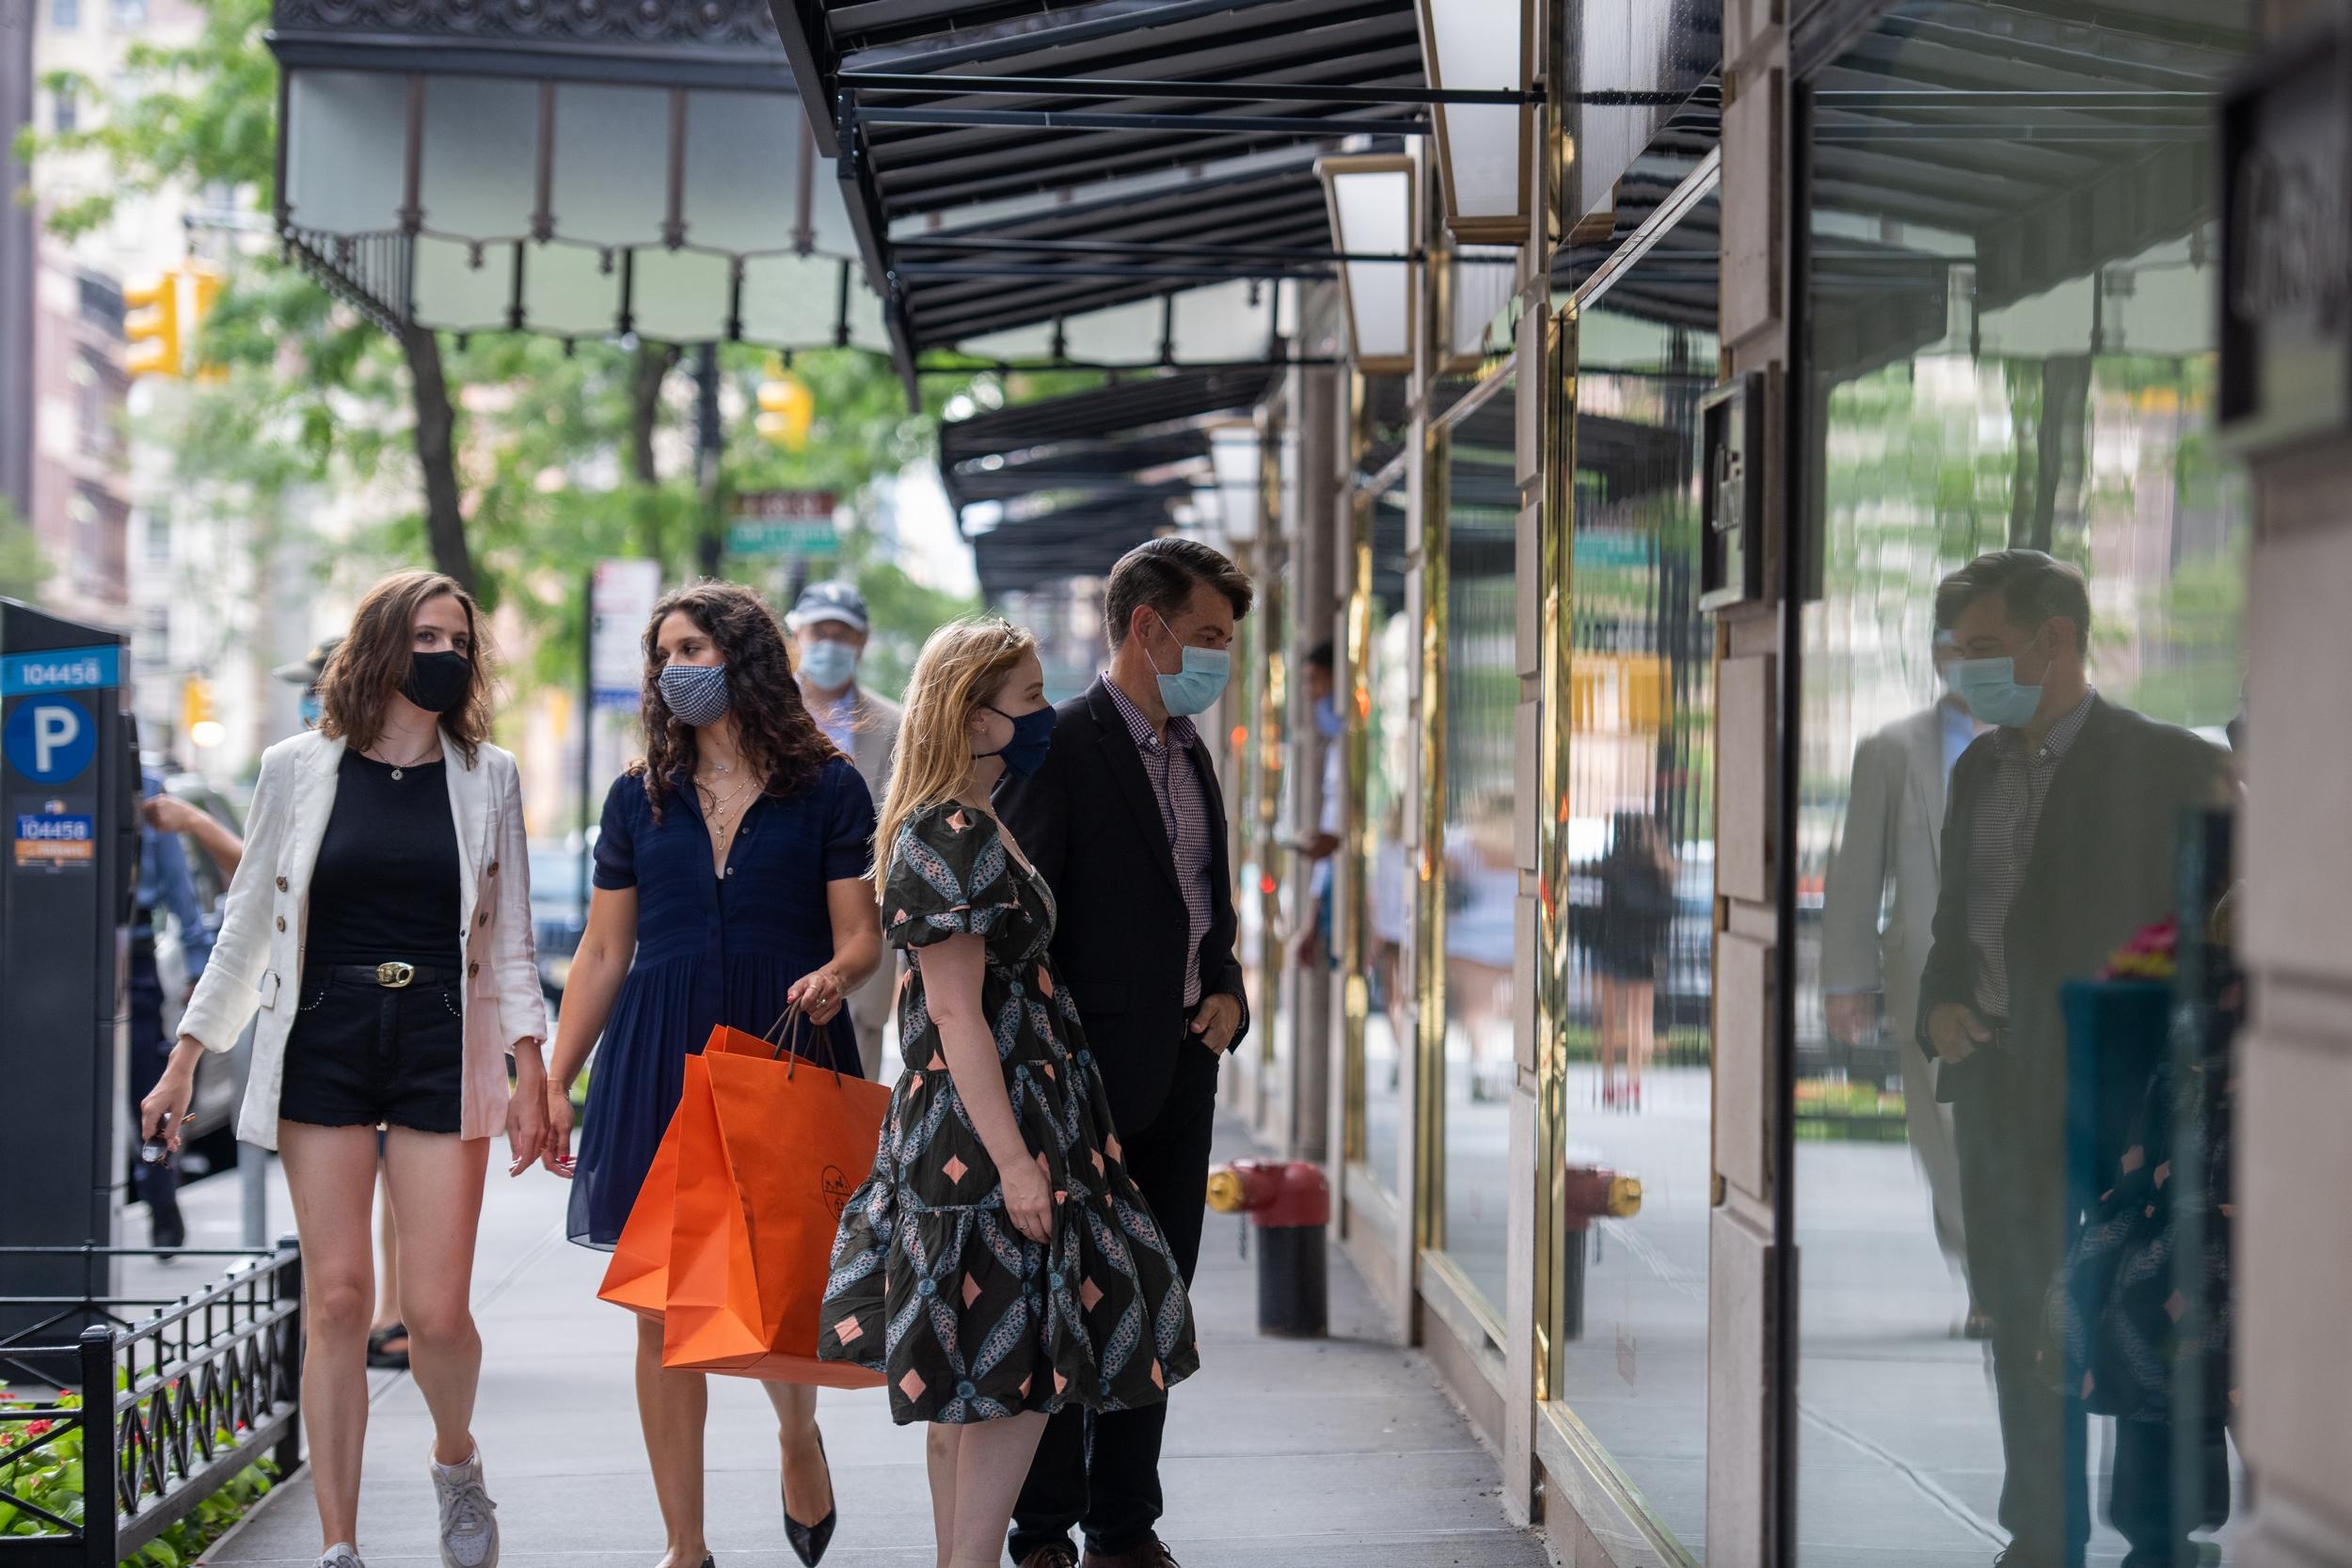 Make a Date on Madison Avenue, February 8-20